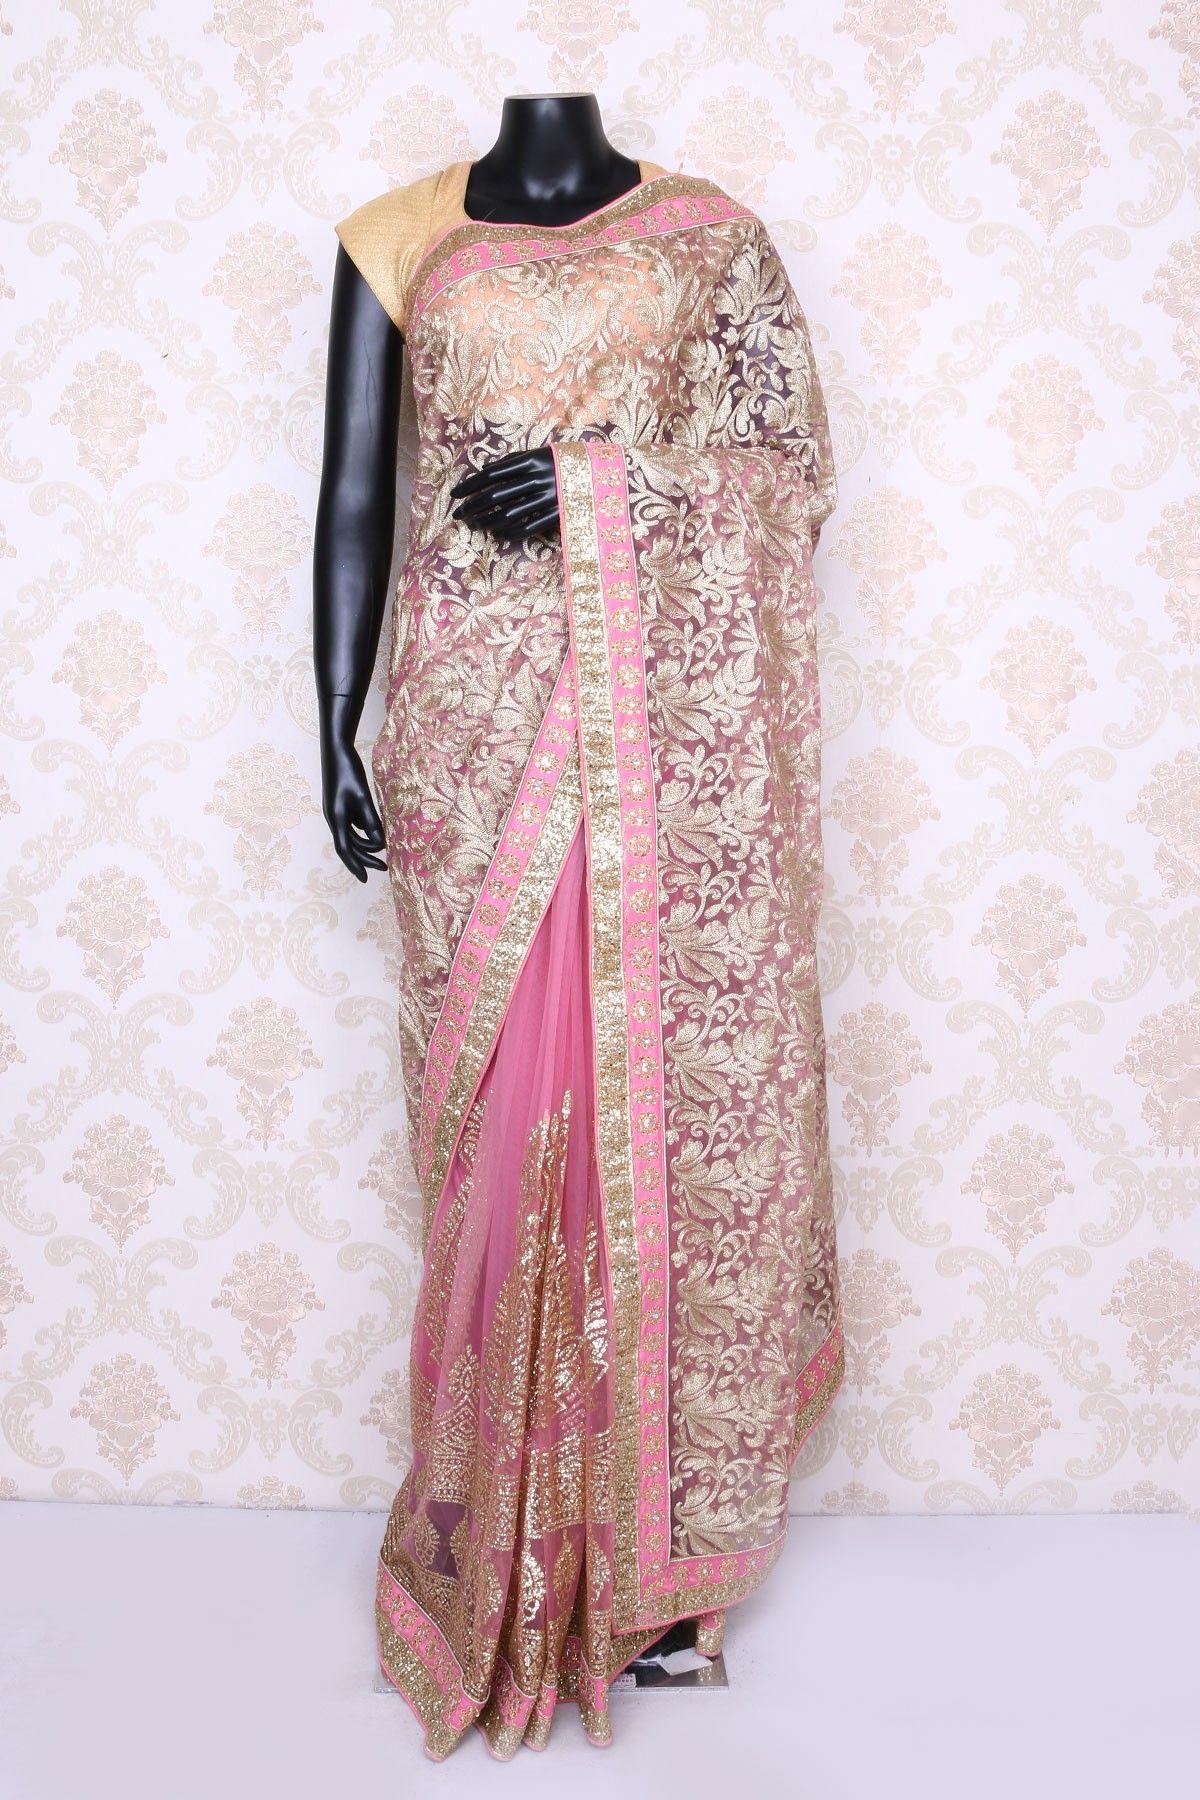 Passion Homes Borders Gold Zardozi Border Handmade Designers - Rose pink dull gold net lovely saree with satin border sr12912